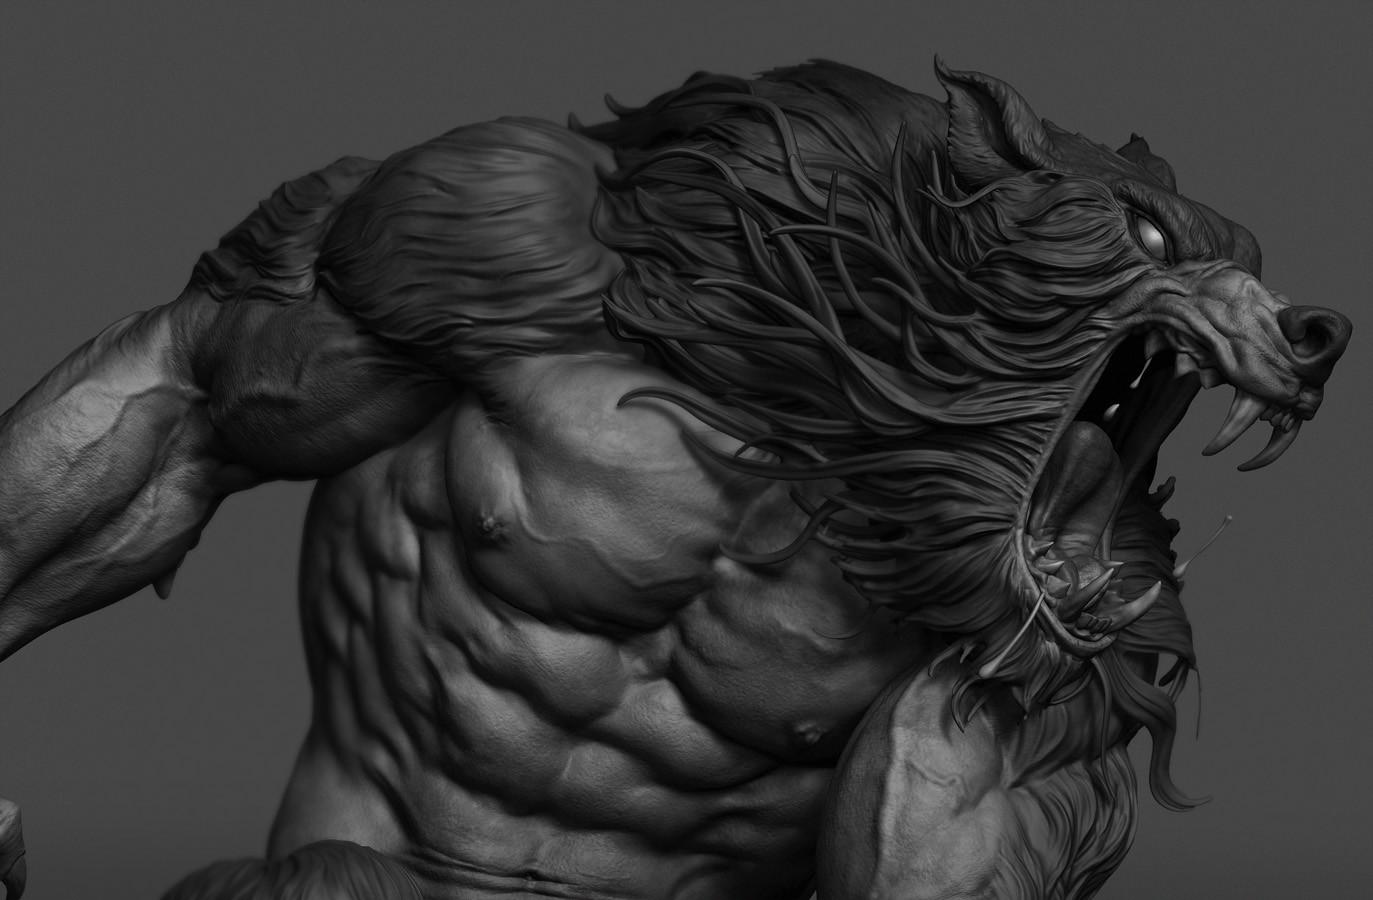 Tiago rios werewolf 01